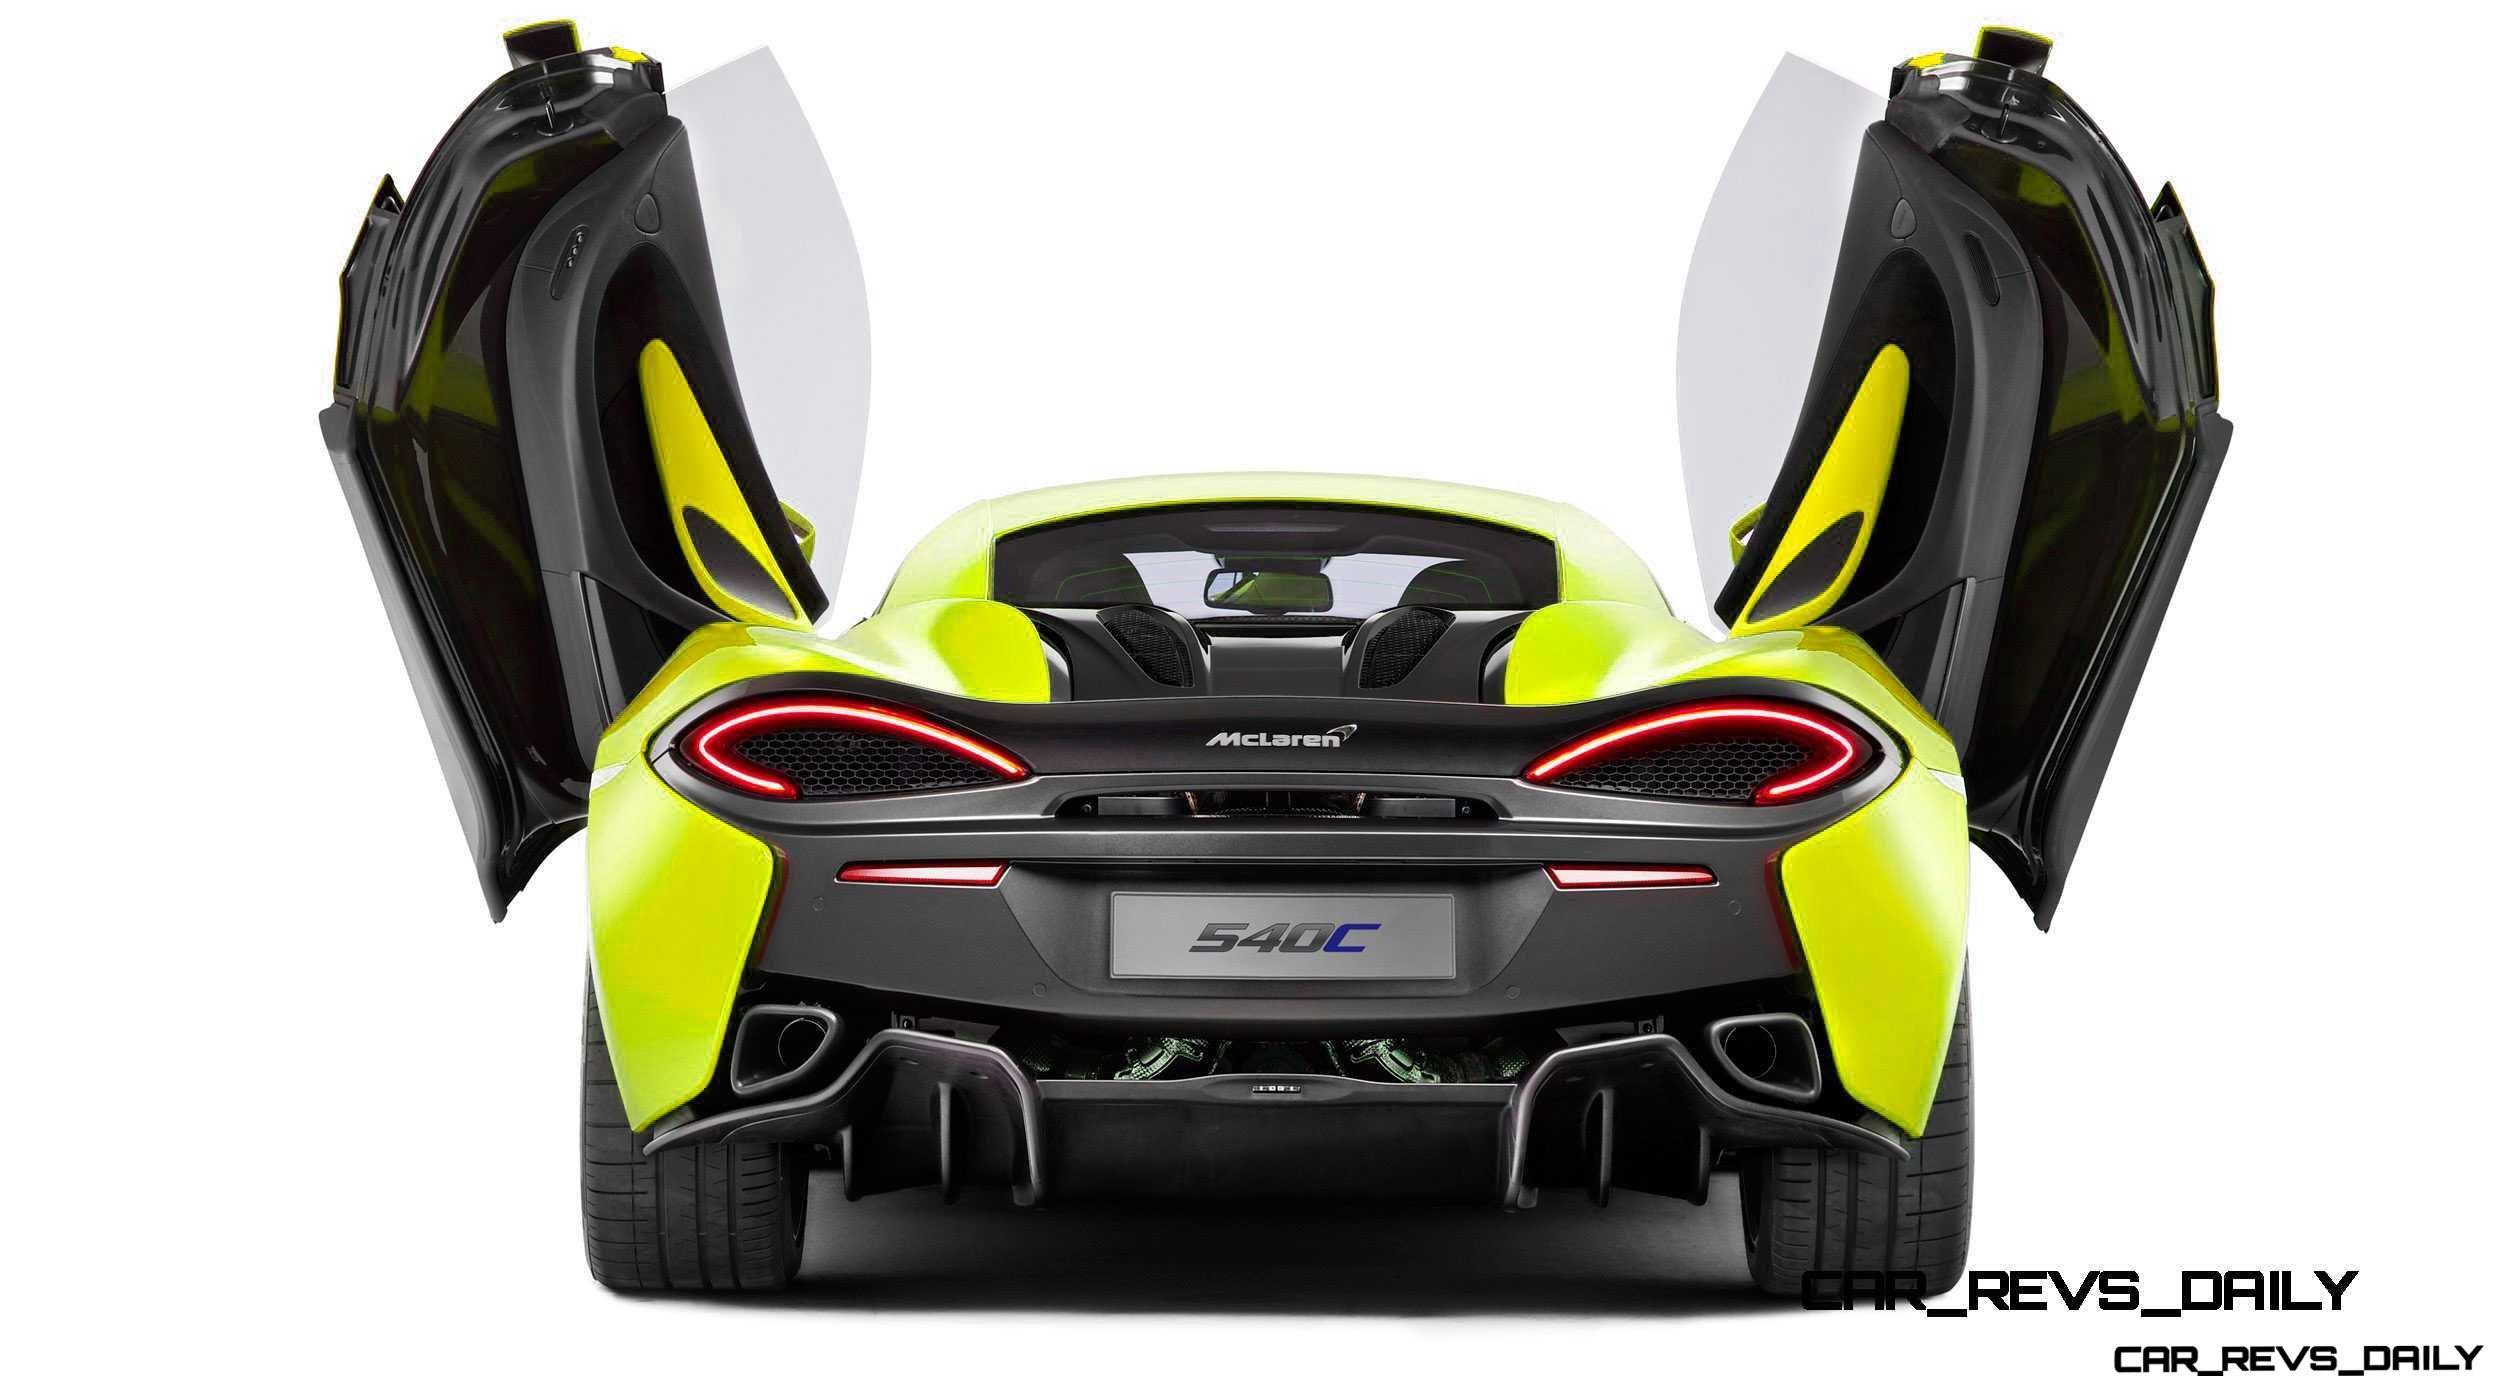 http://www.car-revs-daily.com/wp-content/uploads/2015/04/McLaren_540C_rear_door_upsdfc.jpg